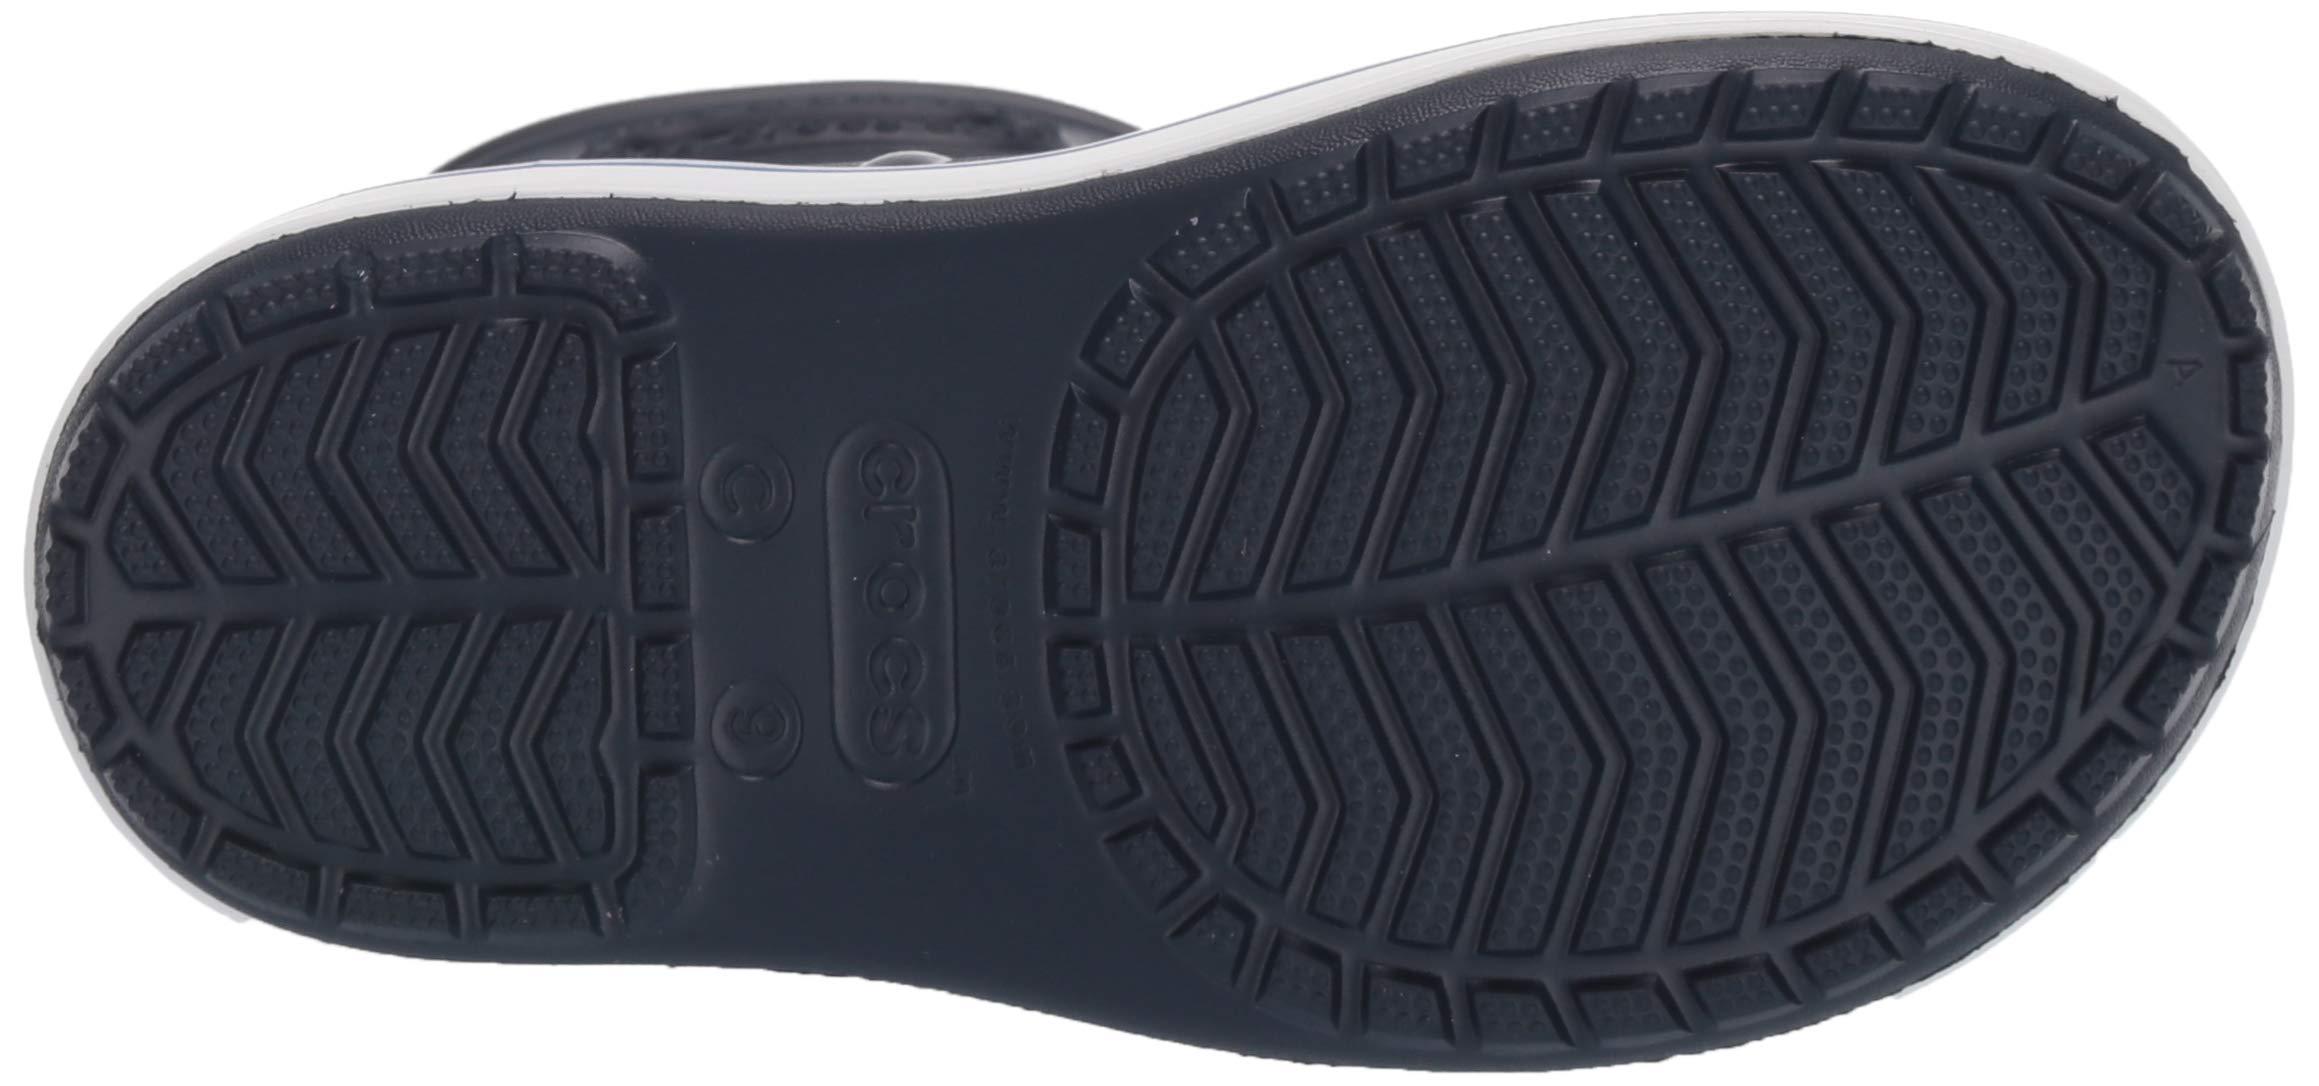 Crocs Unisex Crocband Rain Boot, Navy/Bright Cobalt, 2 M US Little Kid by Crocs (Image #3)